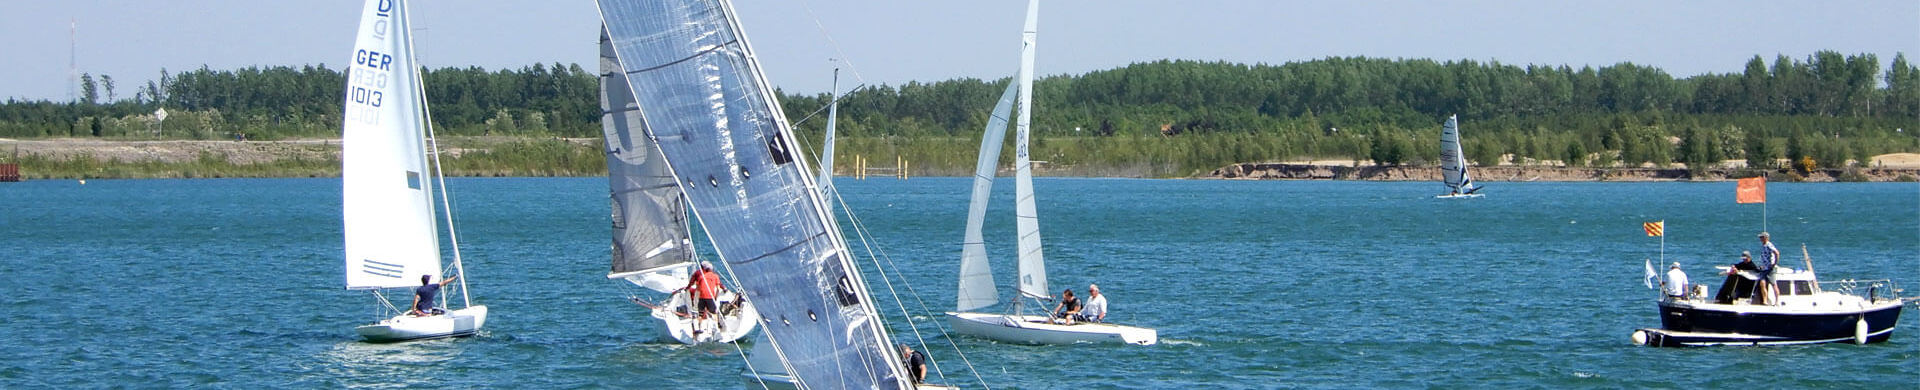 Folgeseite Segelboote